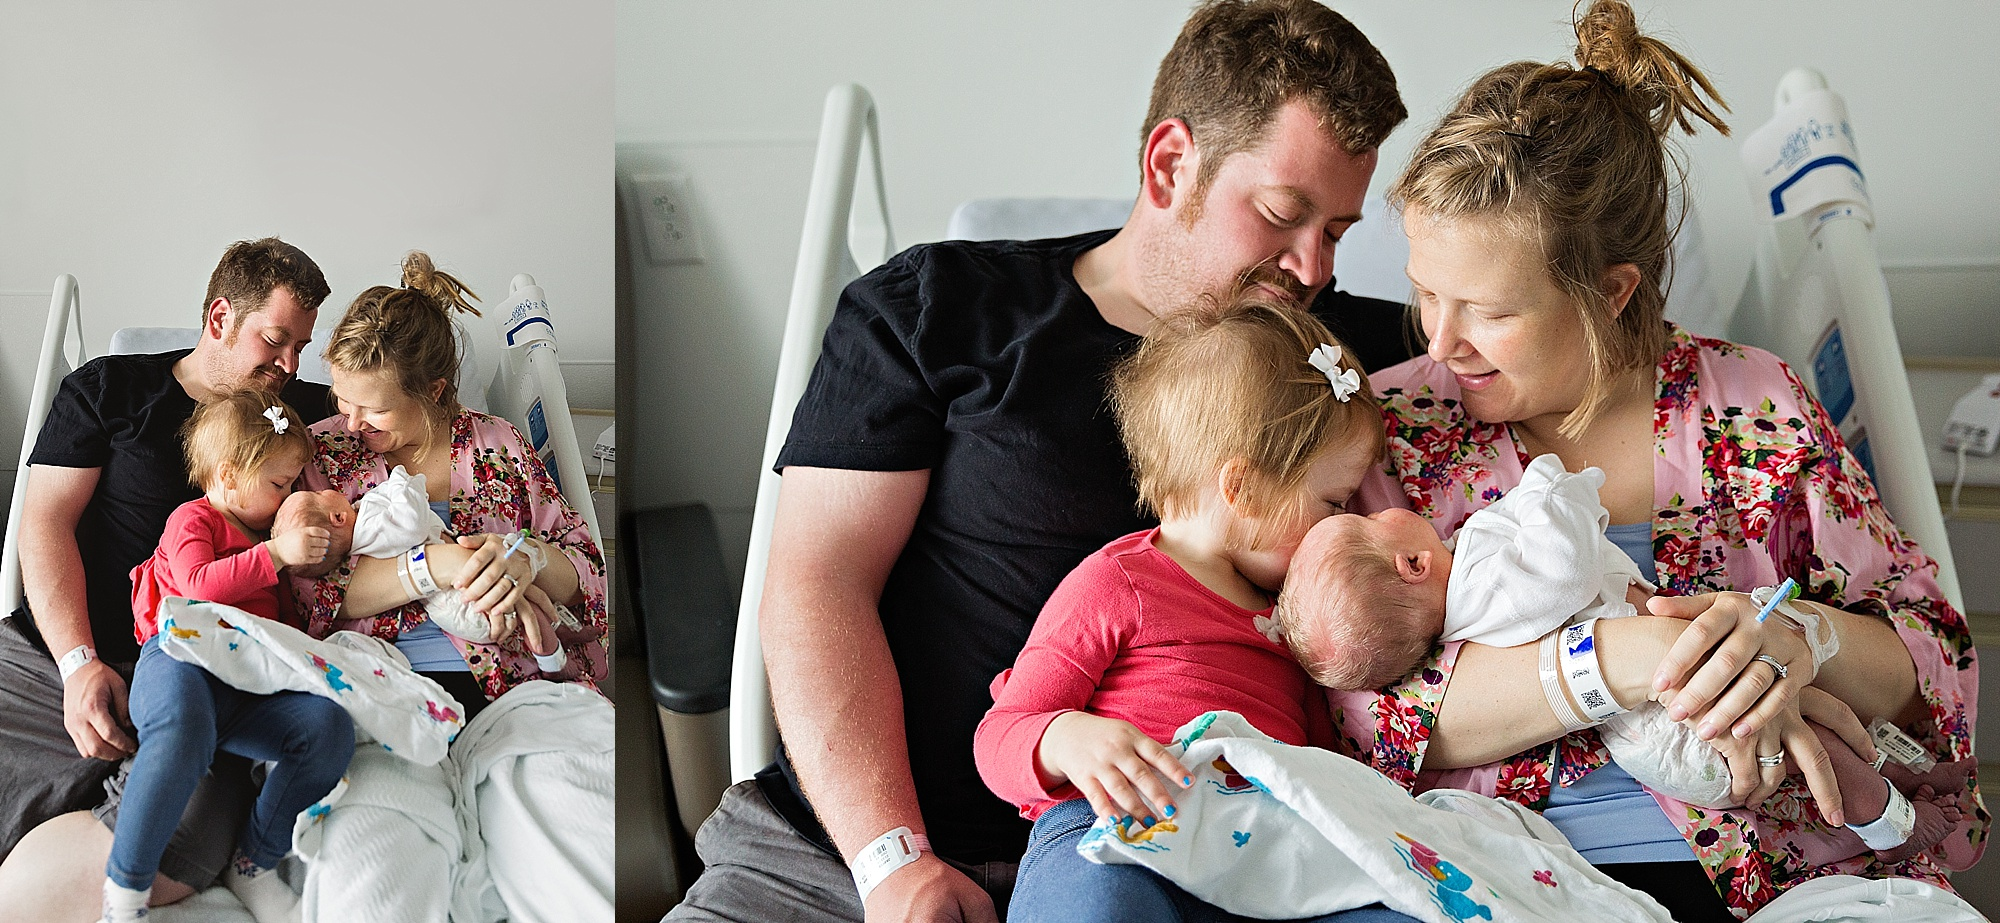 lauren-grayson-photography-akron-ohio-photographer-family-newborn-fresh-48-baby-hospital-photo-shoot-cleveland-clinic-akron-general-carter_0328.jpg